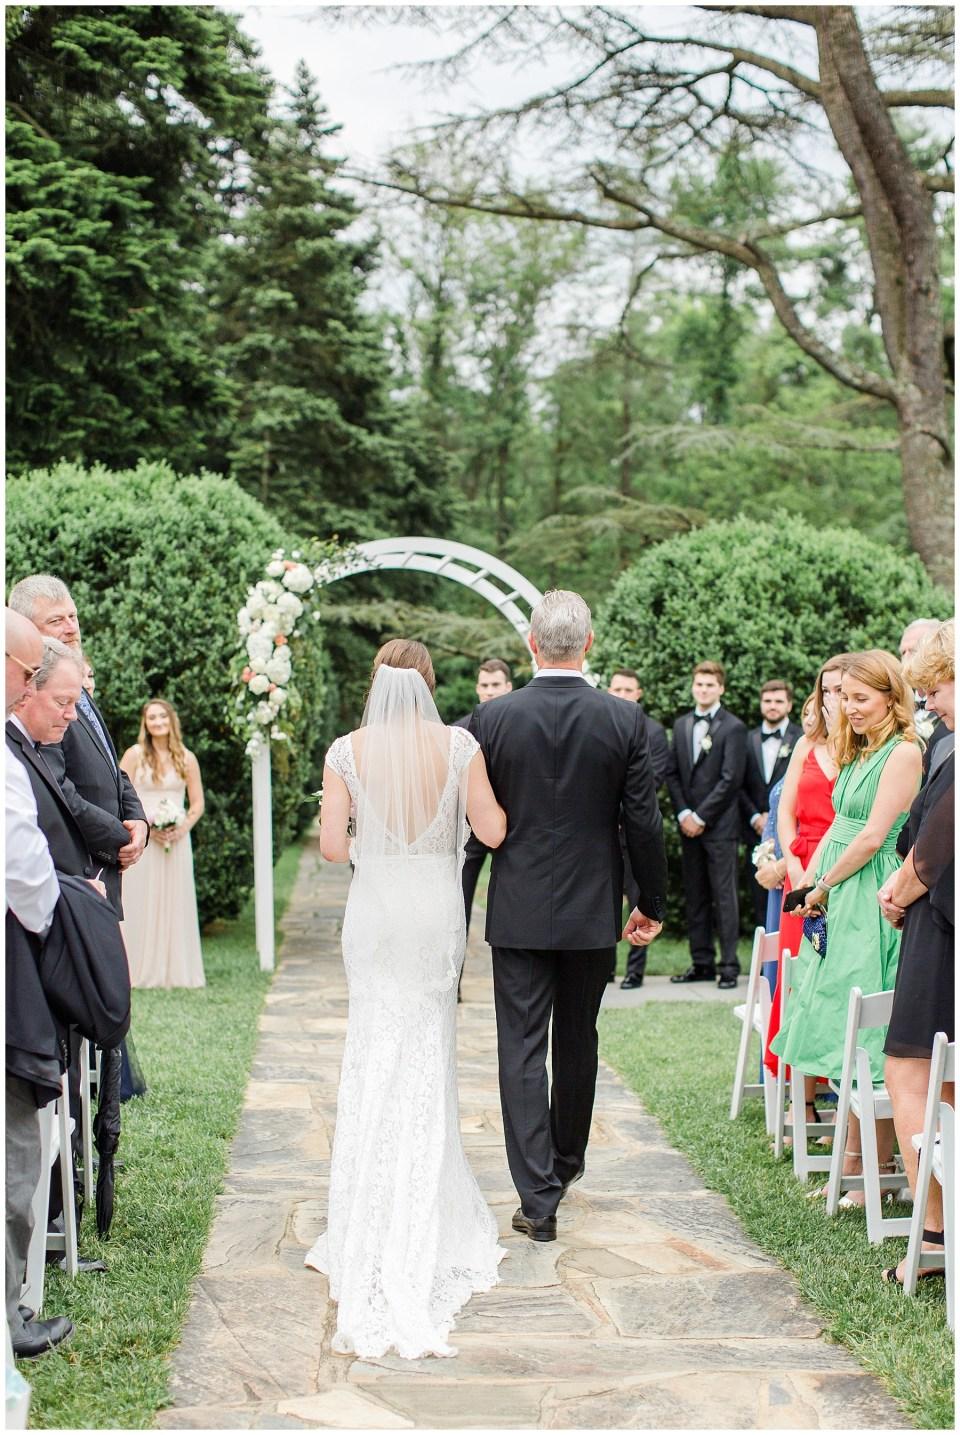 rust-manor-house-wedding-photos-virginia-leesburg-wedding-photographer-89_photos.jpg